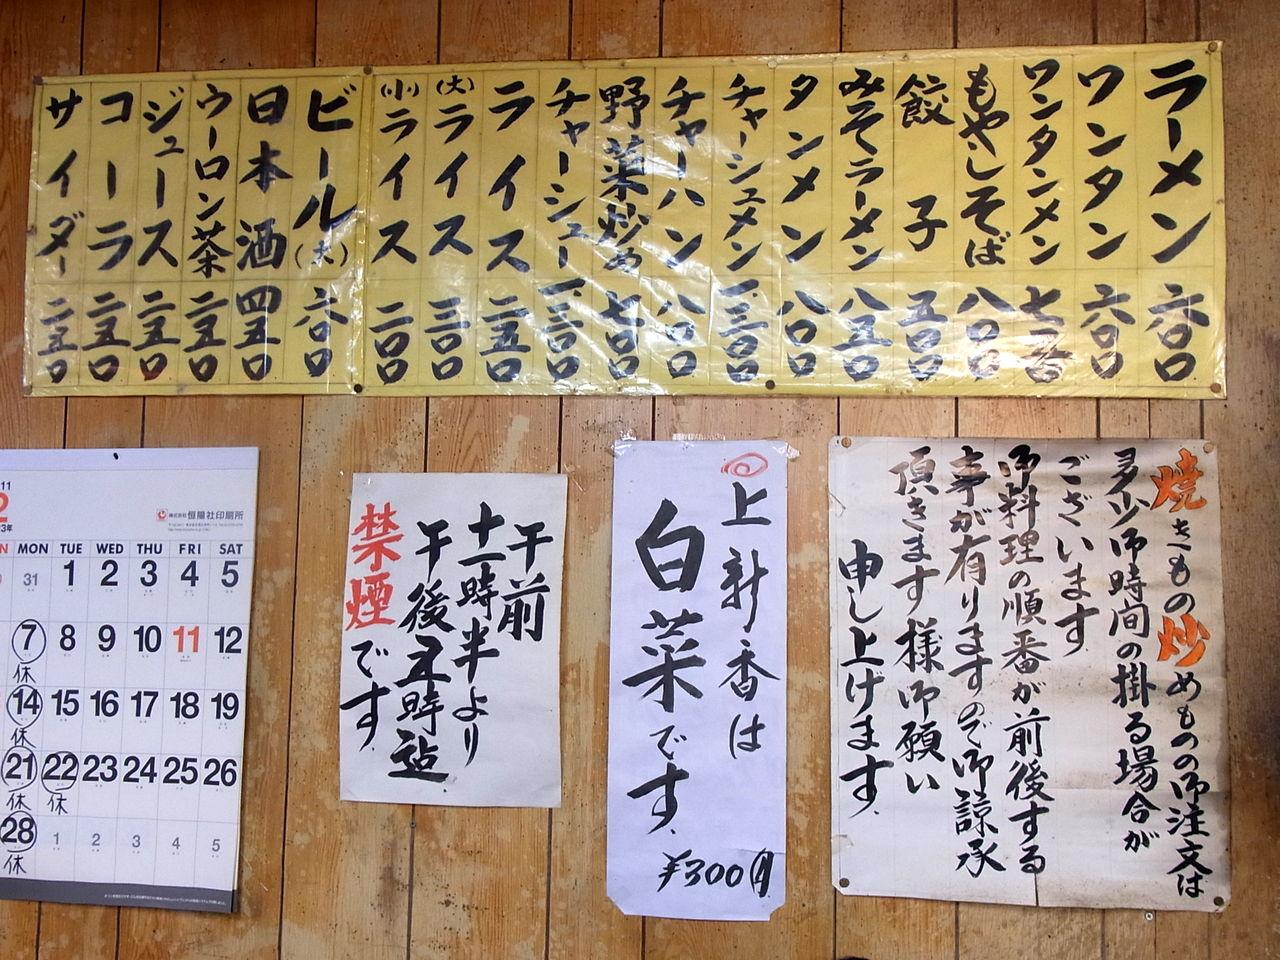 B級グルメとラーメン二郎の食べある記 : 東京マラソン2011 と ...